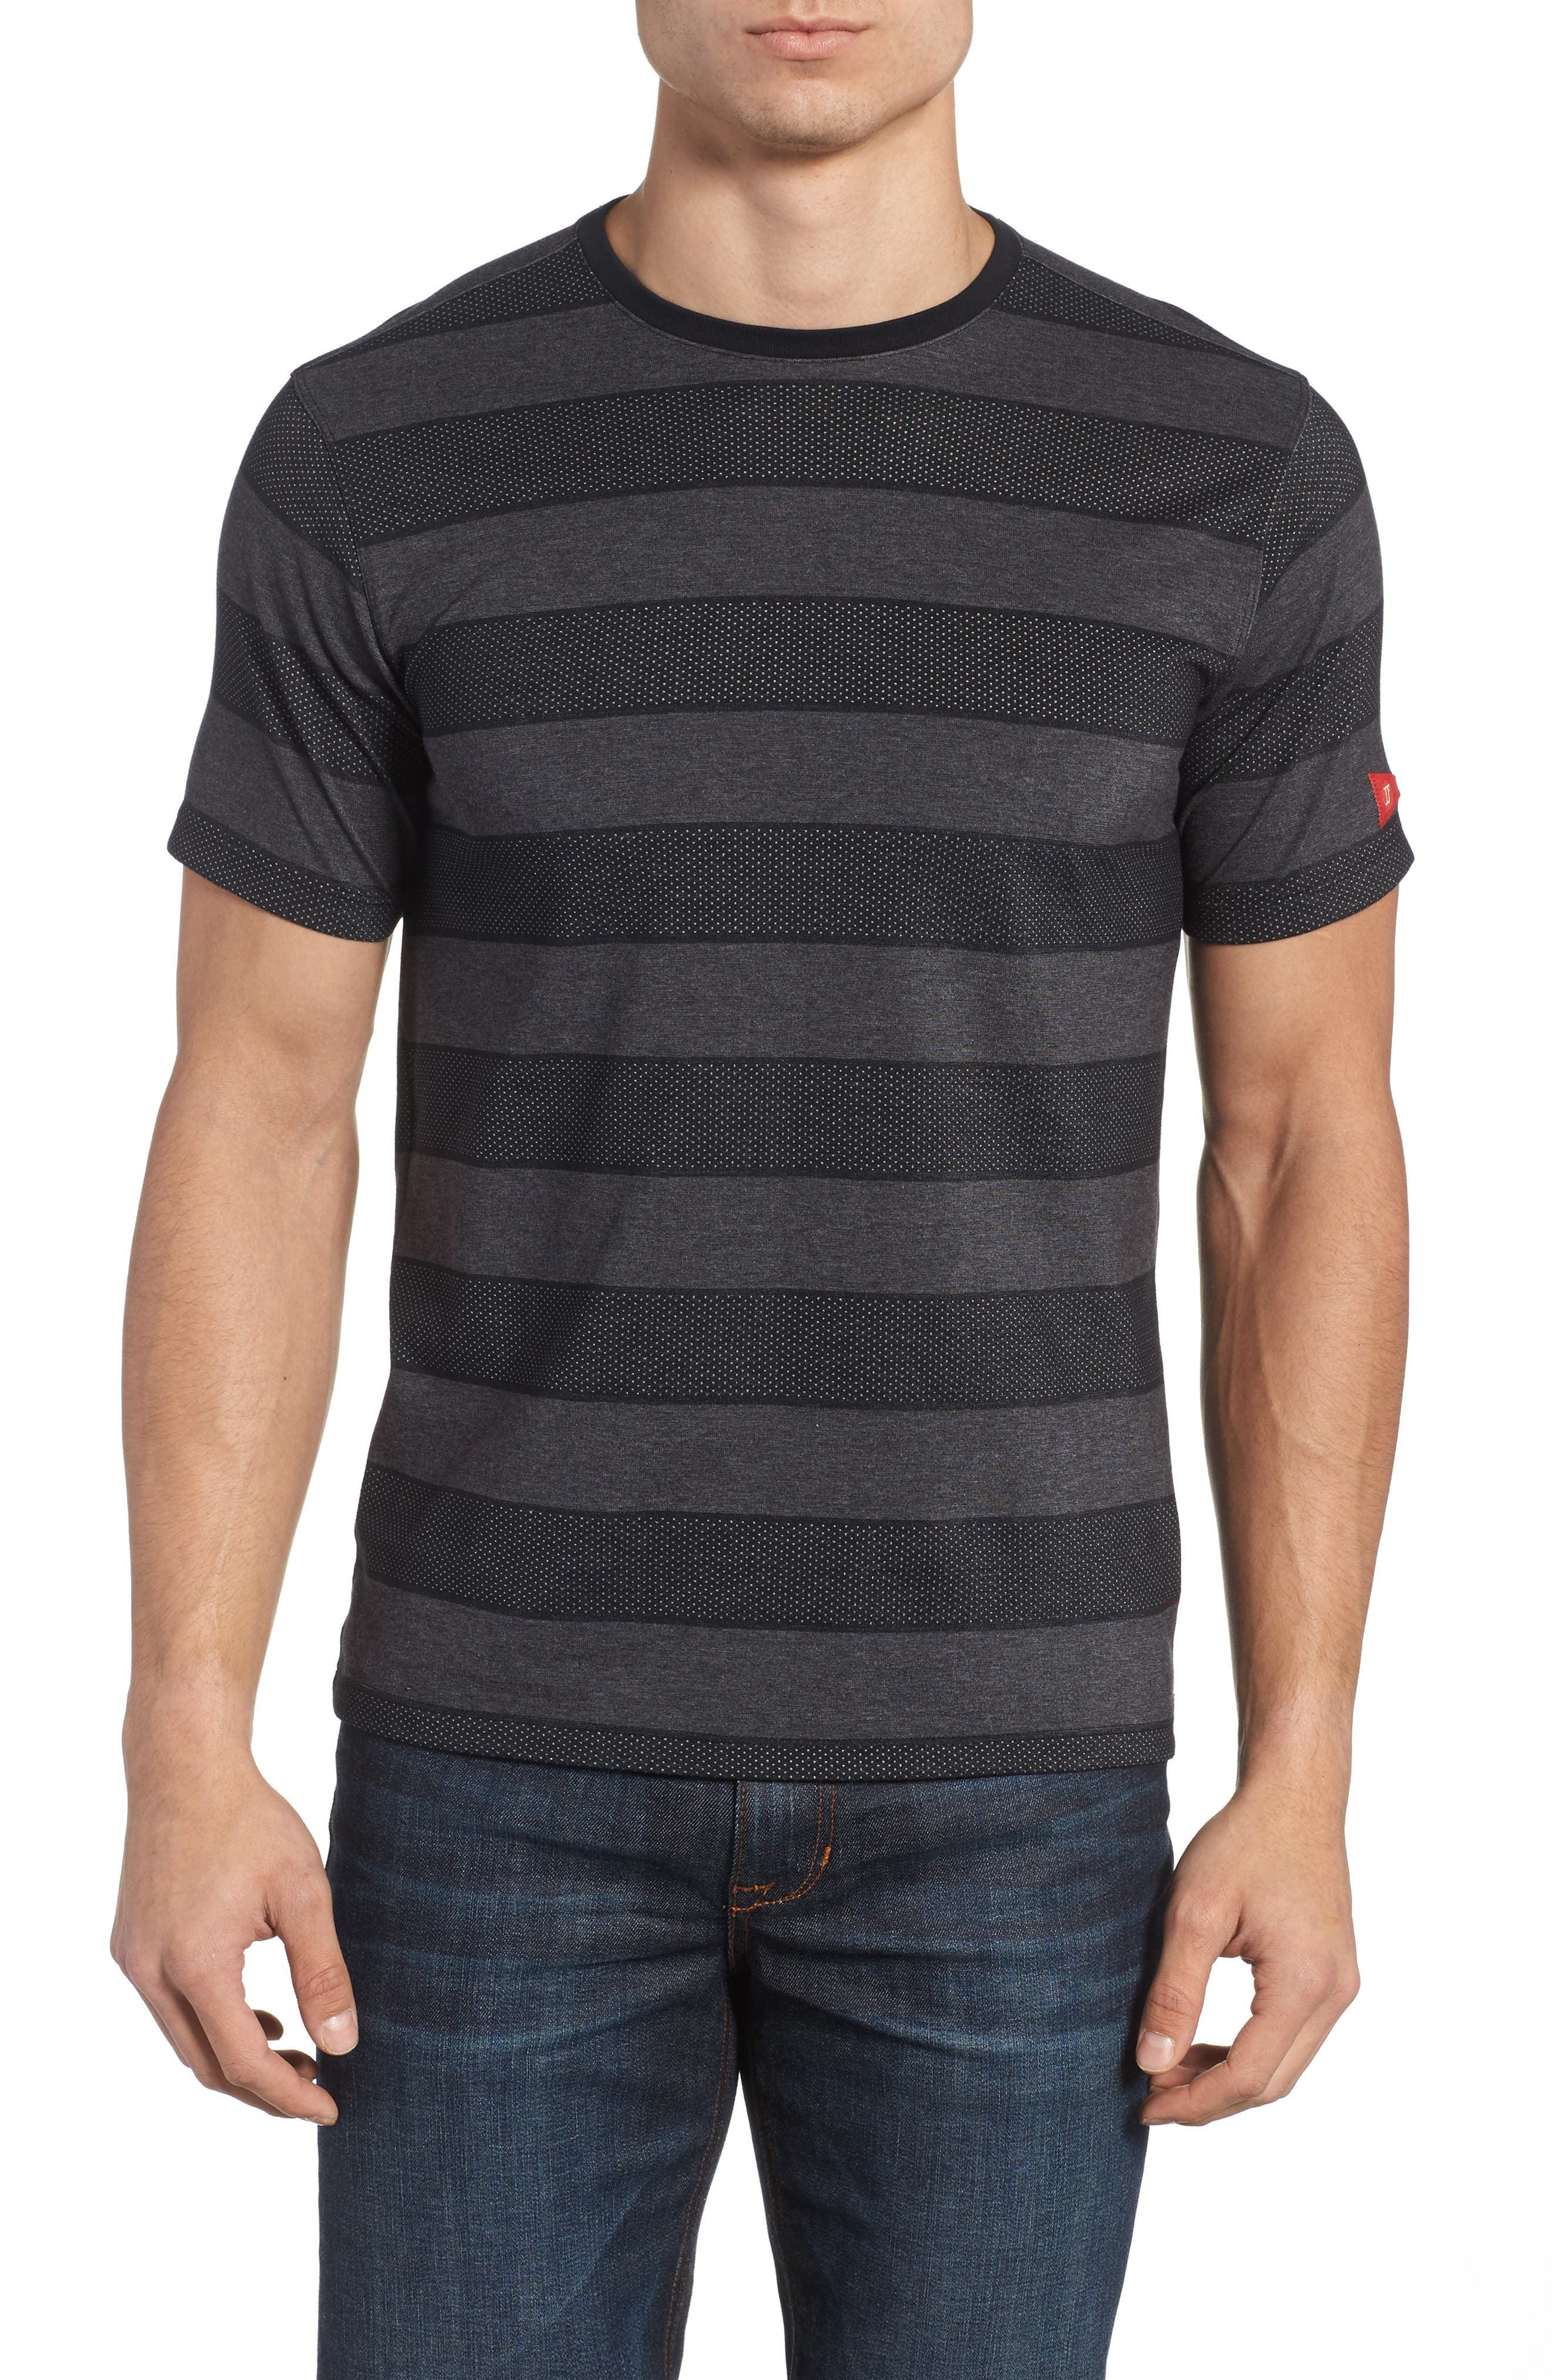 Alternate Image 1 Selected - Hurley Regatta Dri-FIT T-Shirt